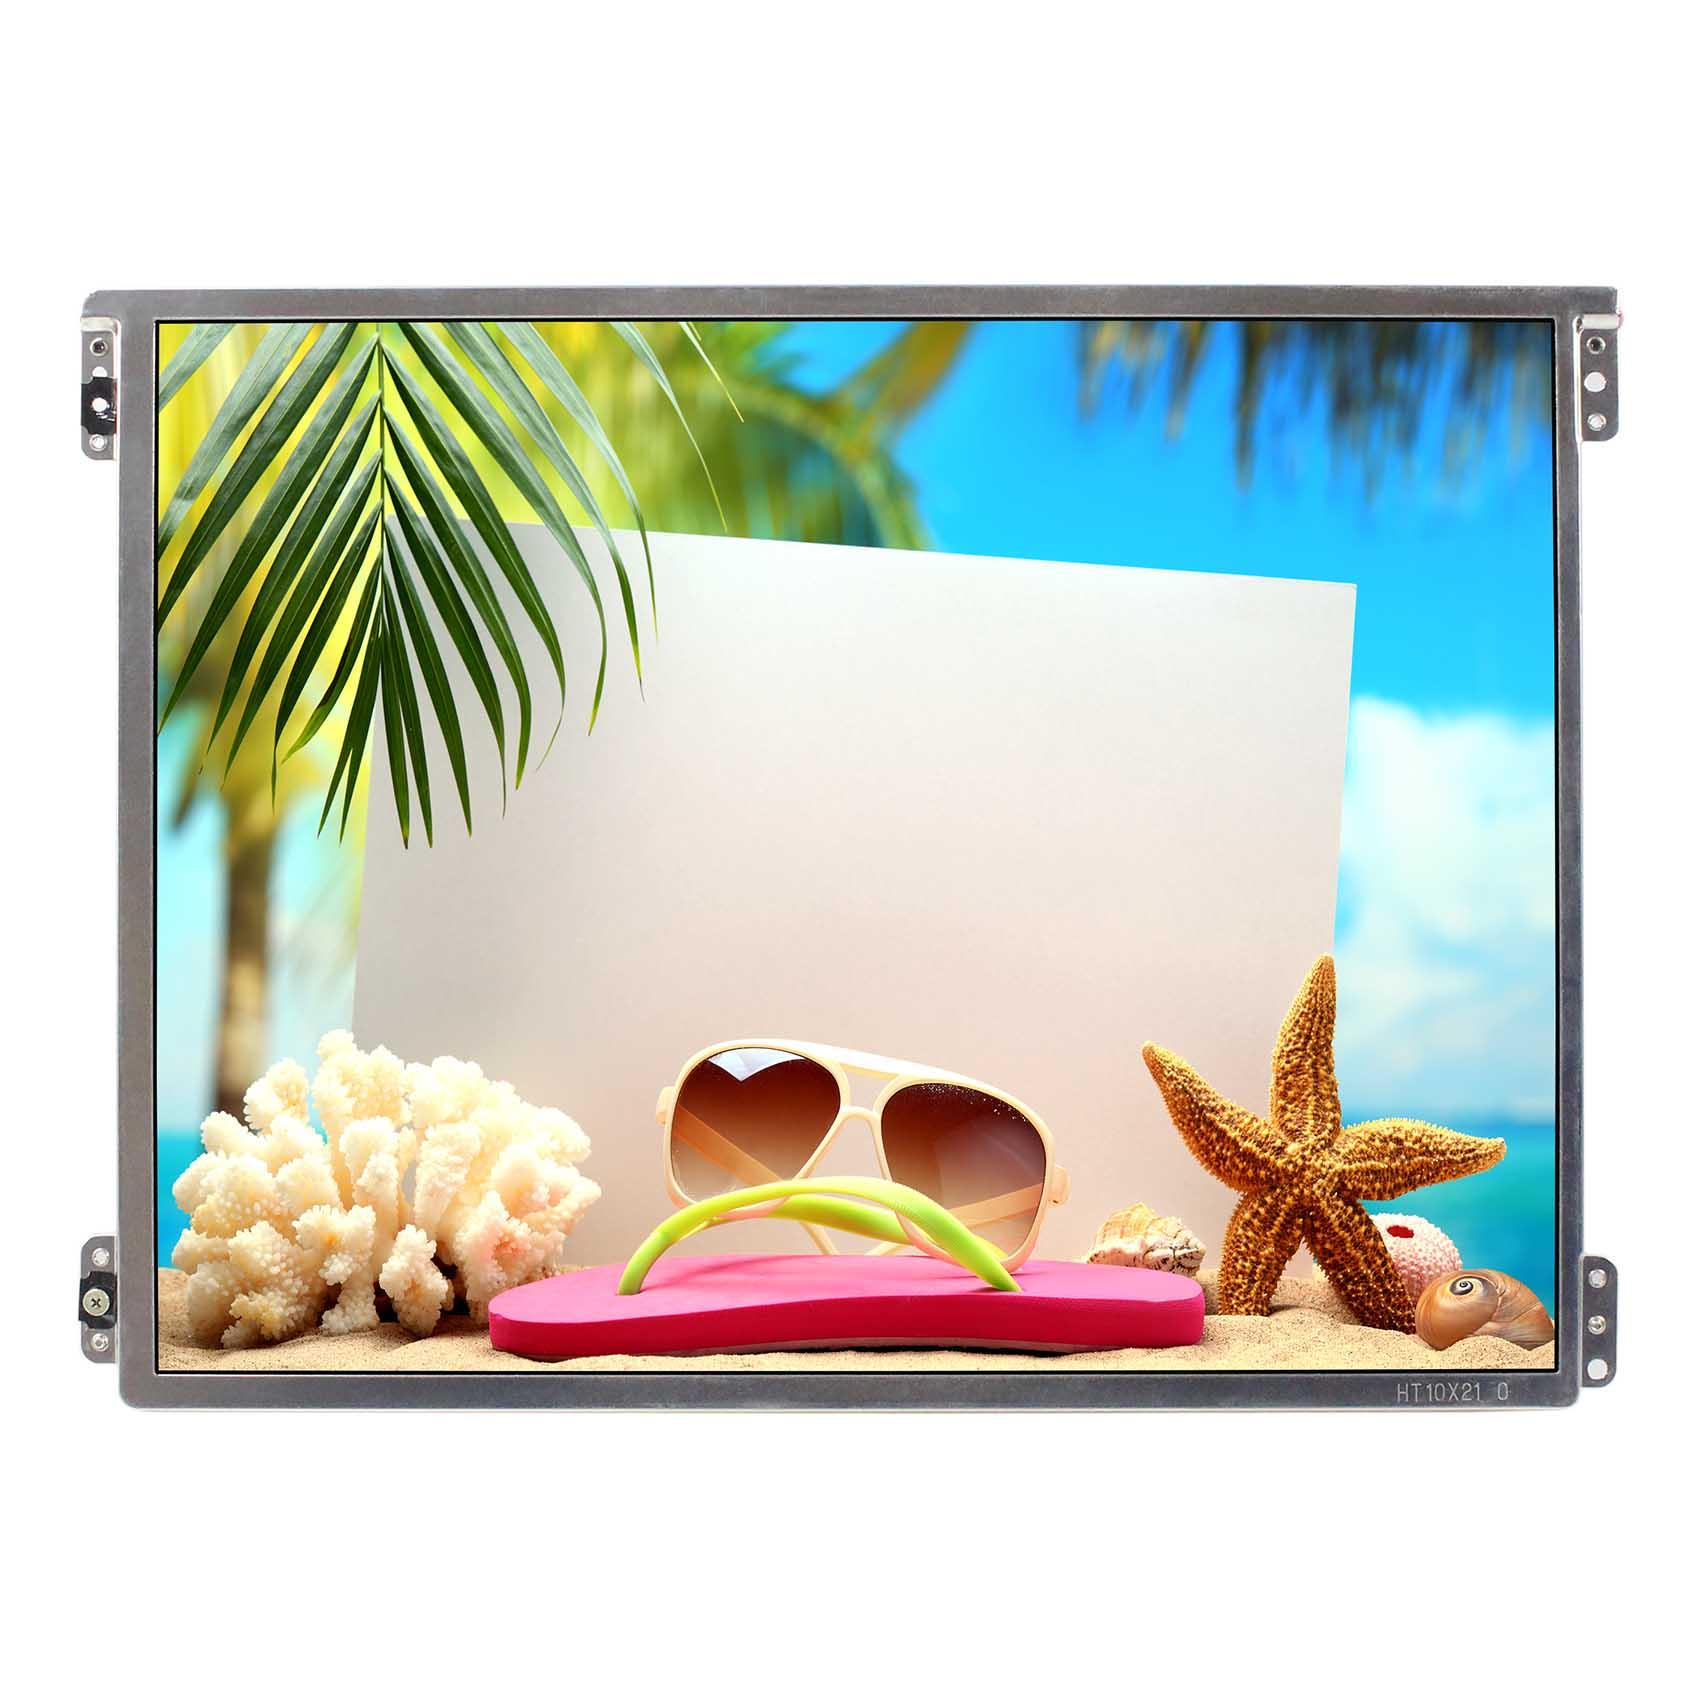 10.4inch HT10X21-311 1024X768 IPS LCD Screen10.4inch HT10X21-311 1024X768 IPS LCD Screen